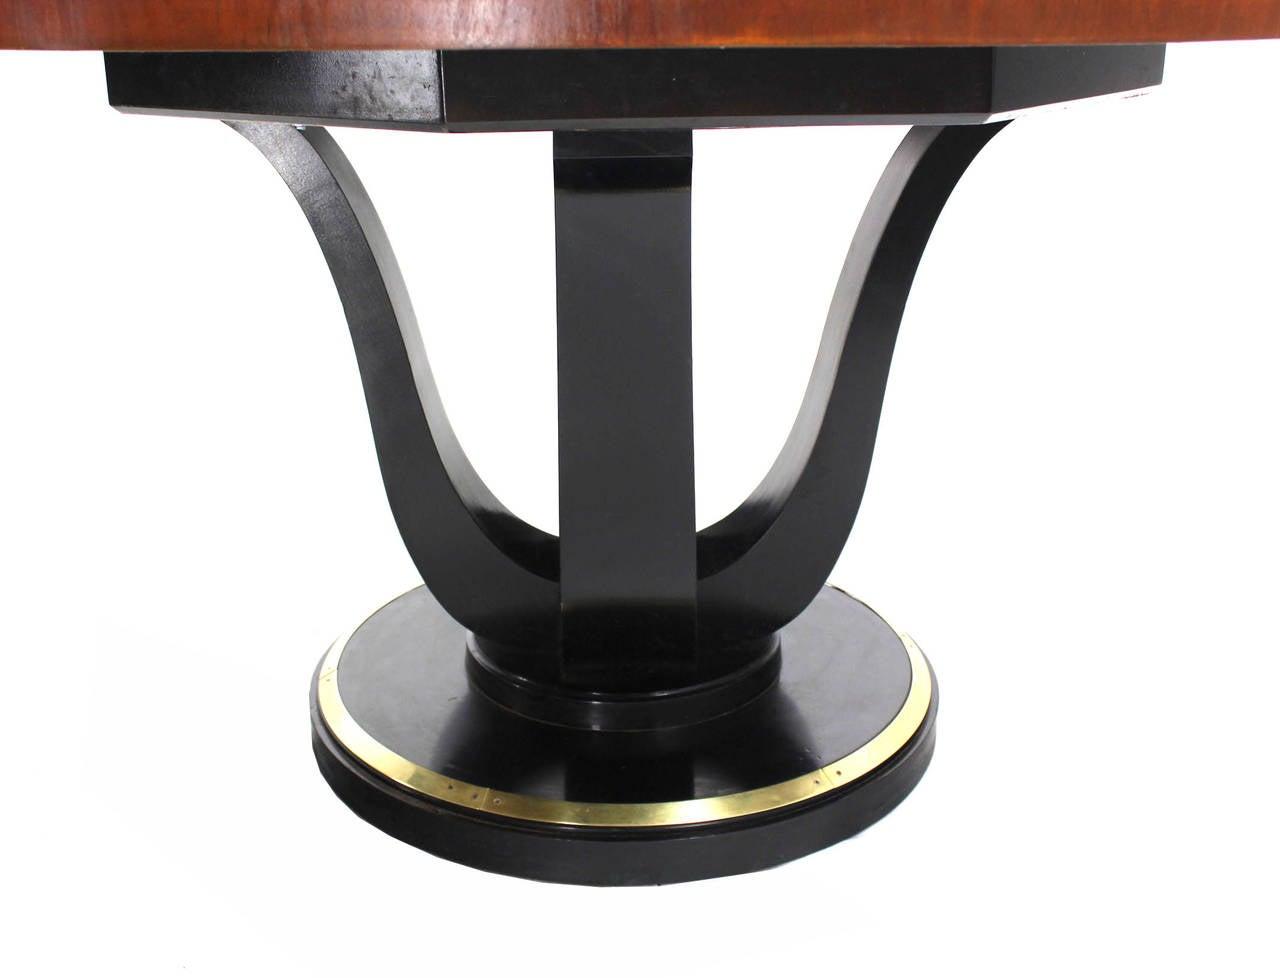 Henredon Single Pedestal Round Dining Table at 1stdibs : IMG0471l from www.1stdibs.com size 1280 x 978 jpeg 56kB